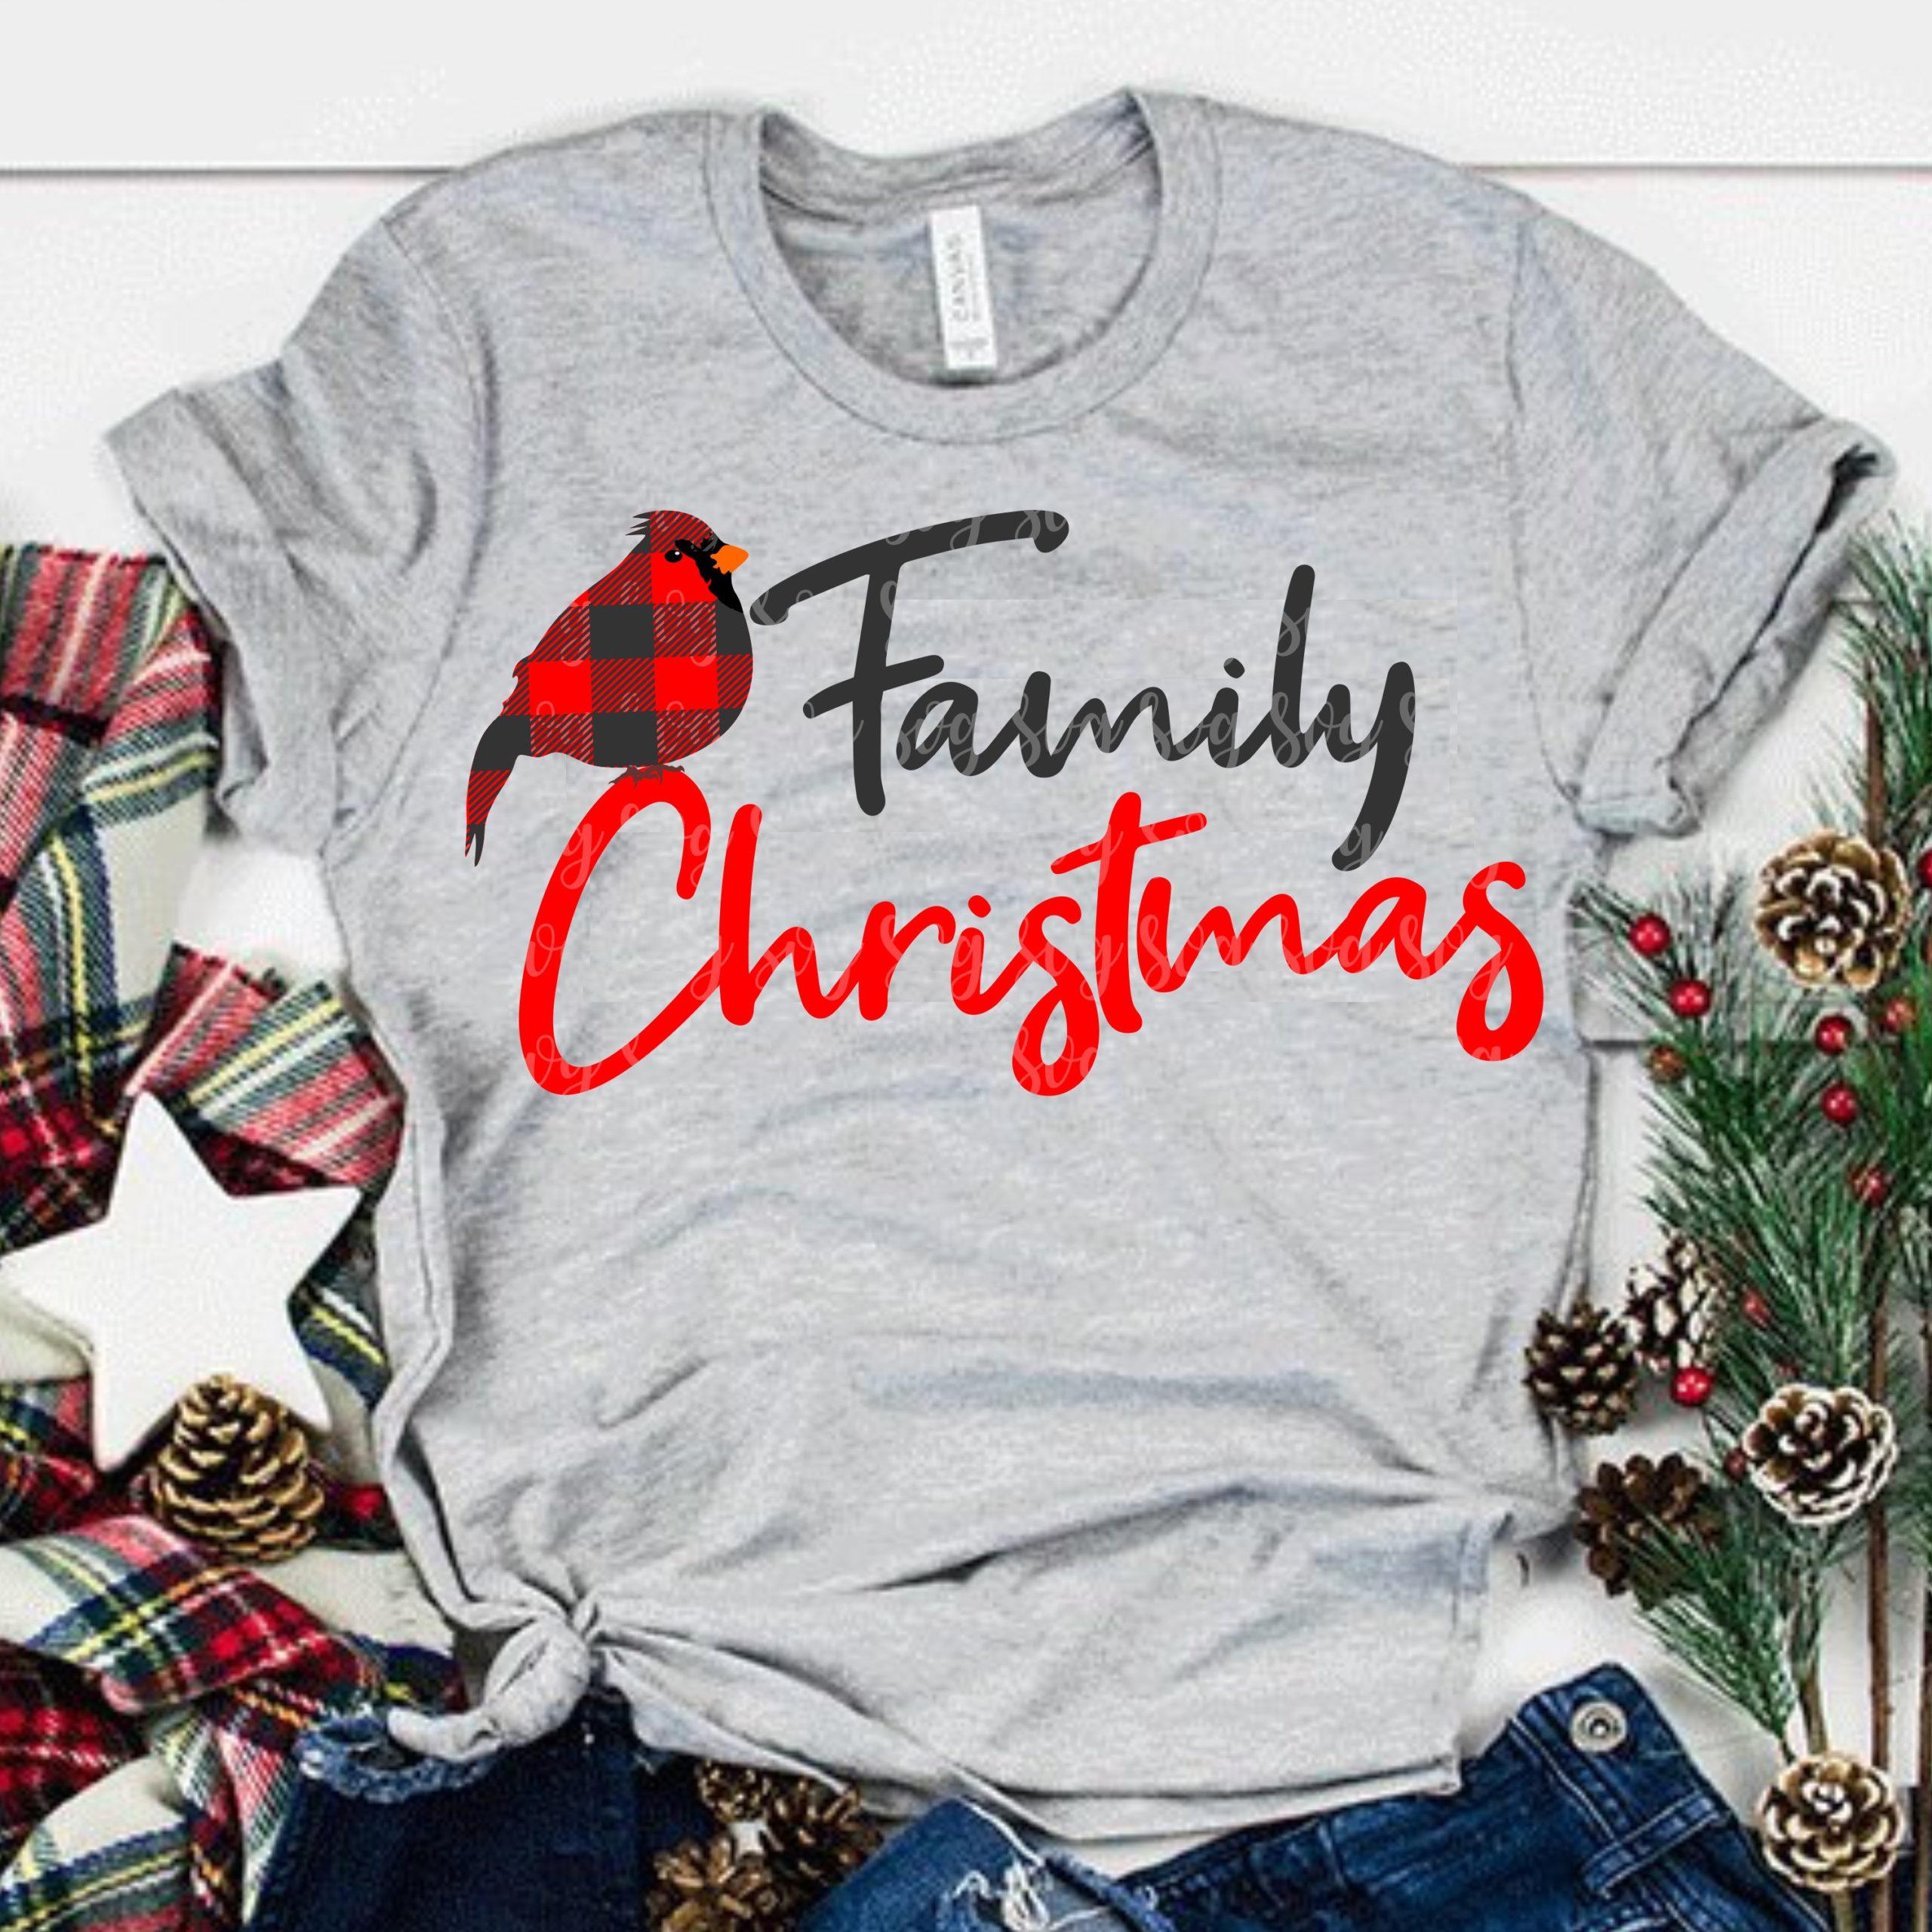 Red Bird Svg Family Christmas Svg Matching Shirt Svg Cardinal Svg Christmas Svg Svg For Cricut Eps Dxf Png Buffalo Plaid Svg Plaid Svg Svg For Cricut